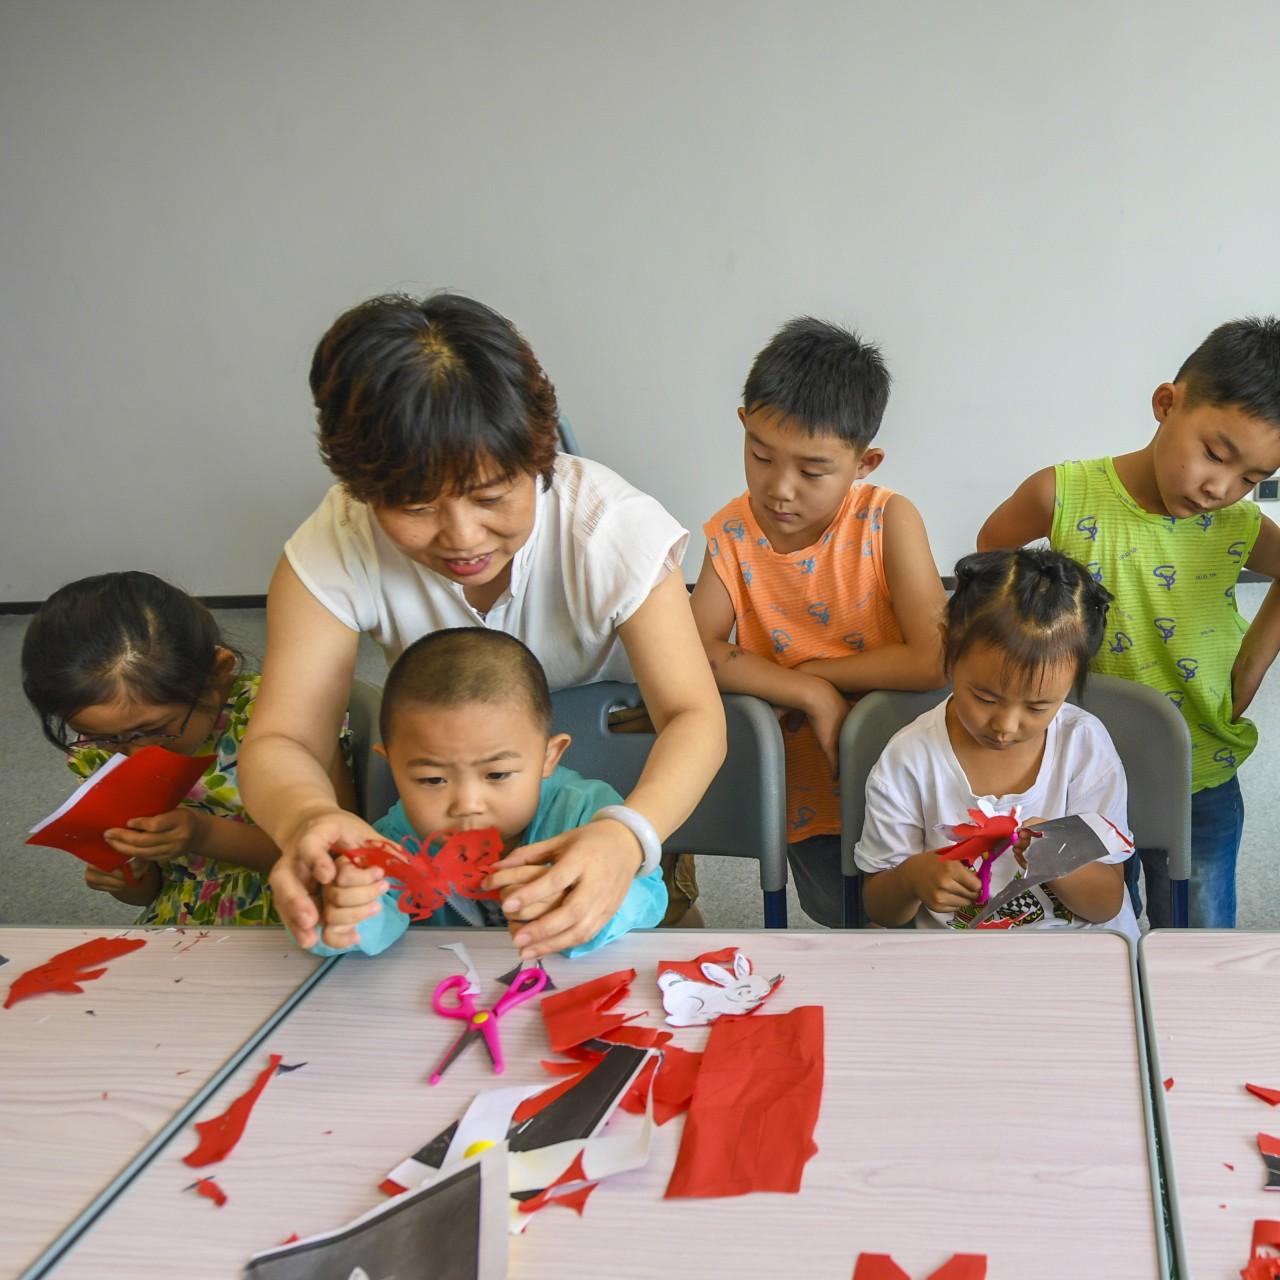 Red Leader X Child Reader